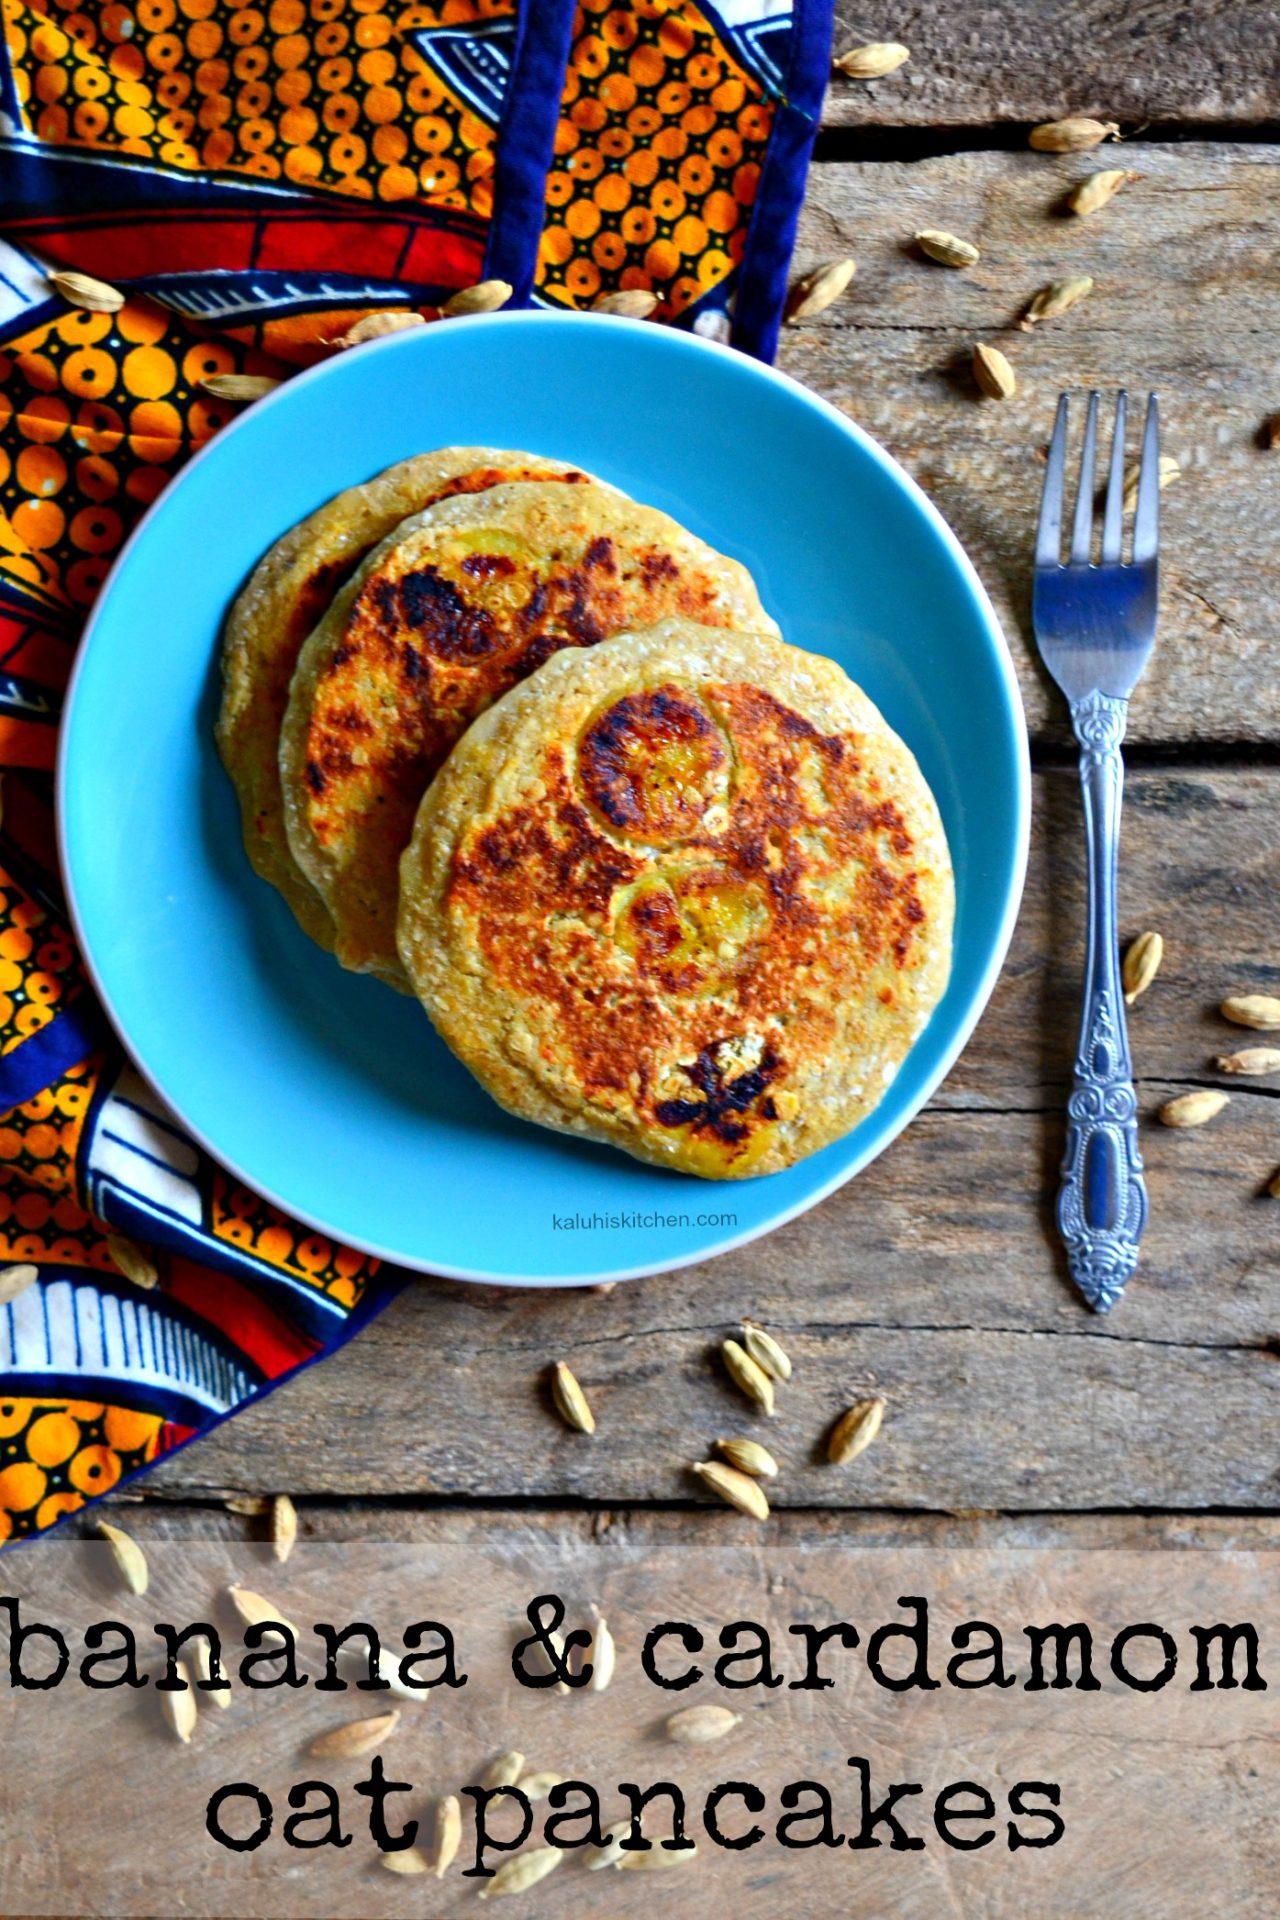 kaluhiskitchen.com_banana and cardamom oat pancakes_kaluhiskitchen.com_best kenyan food blog_kenyan food_pancake recipes